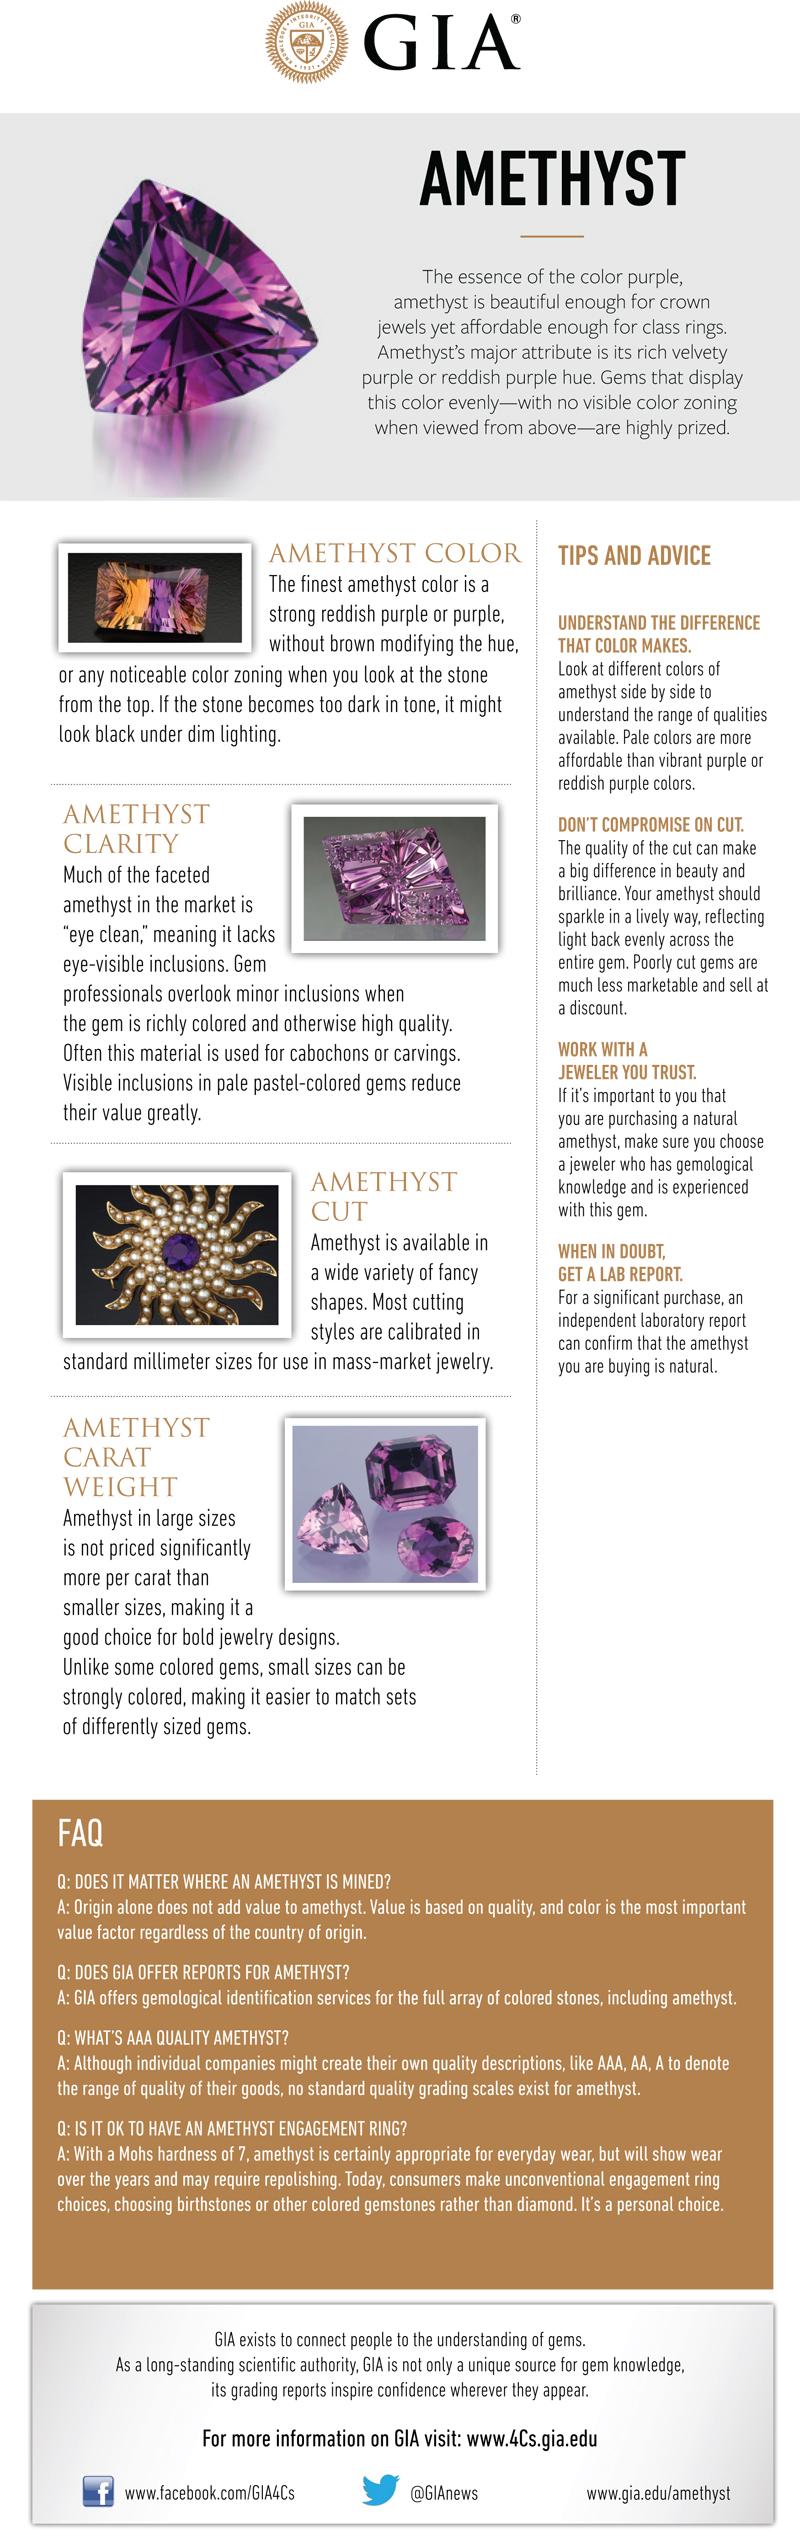 Amethyst-Buying-Guide